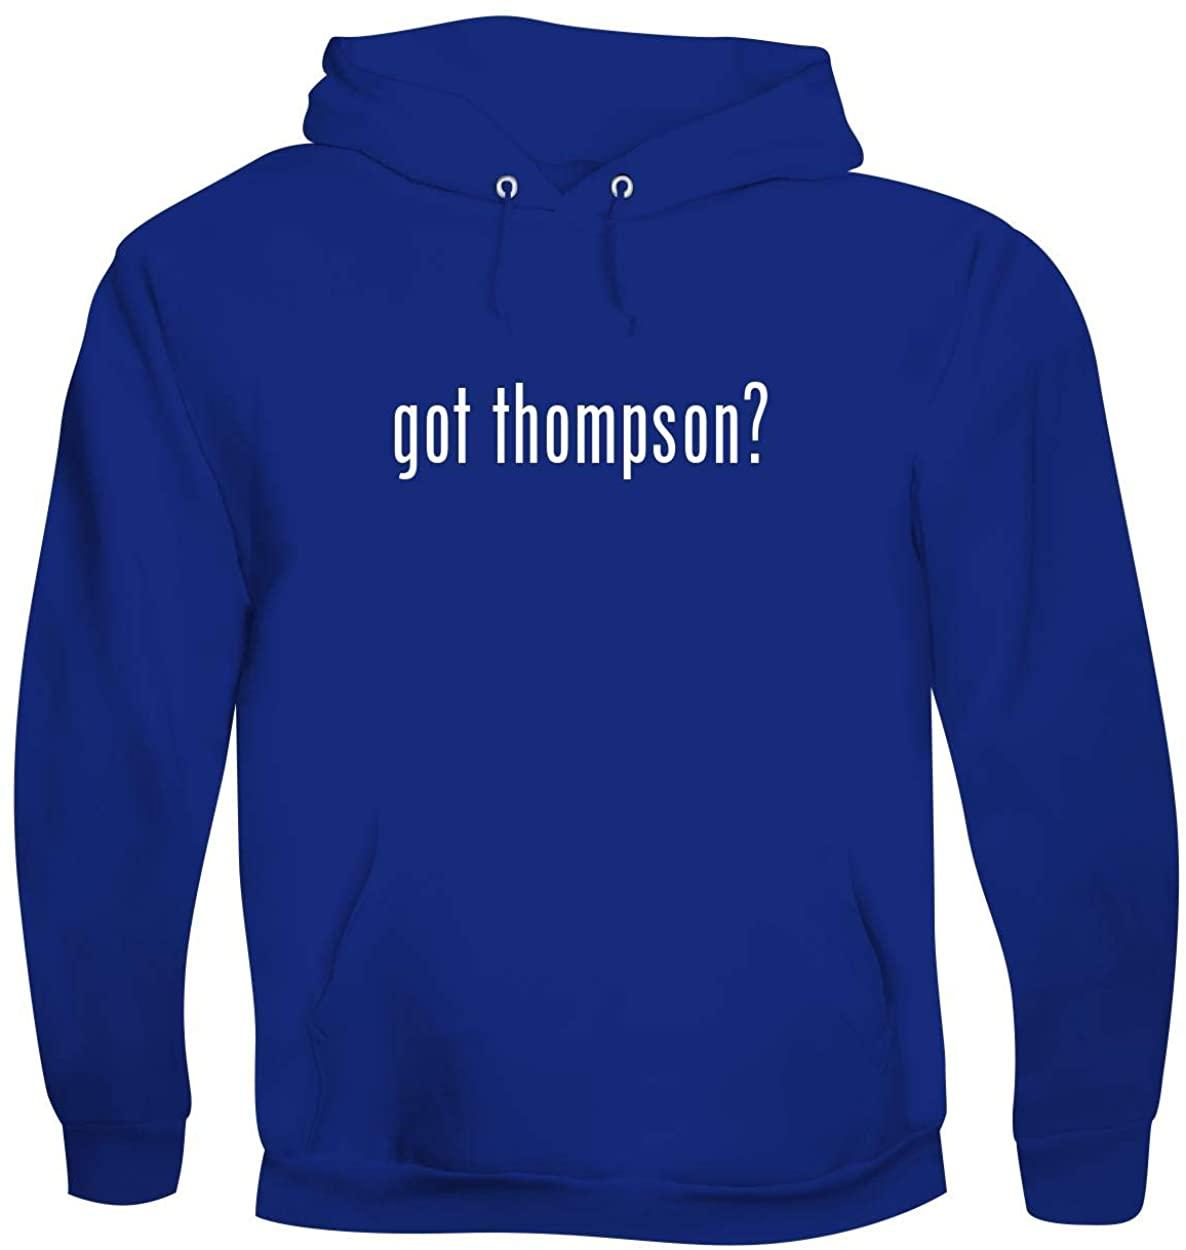 got thompson? - Men's Soft & Comfortable Hoodie Sweatshirt Pullover